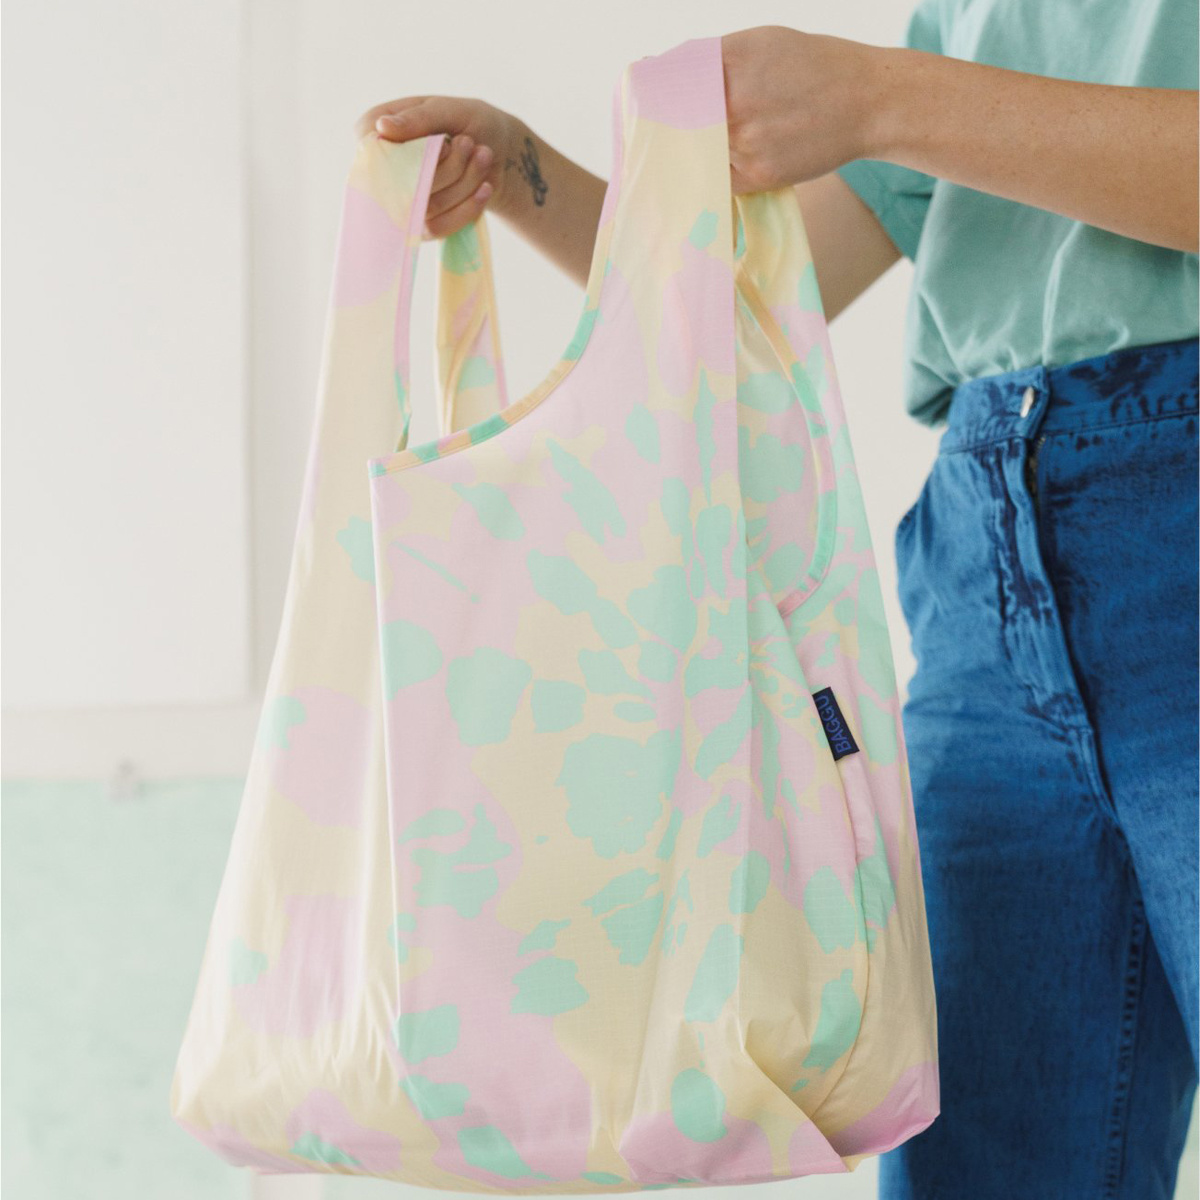 BAGGU Baggu Tie Dye Pink Reusable Bag